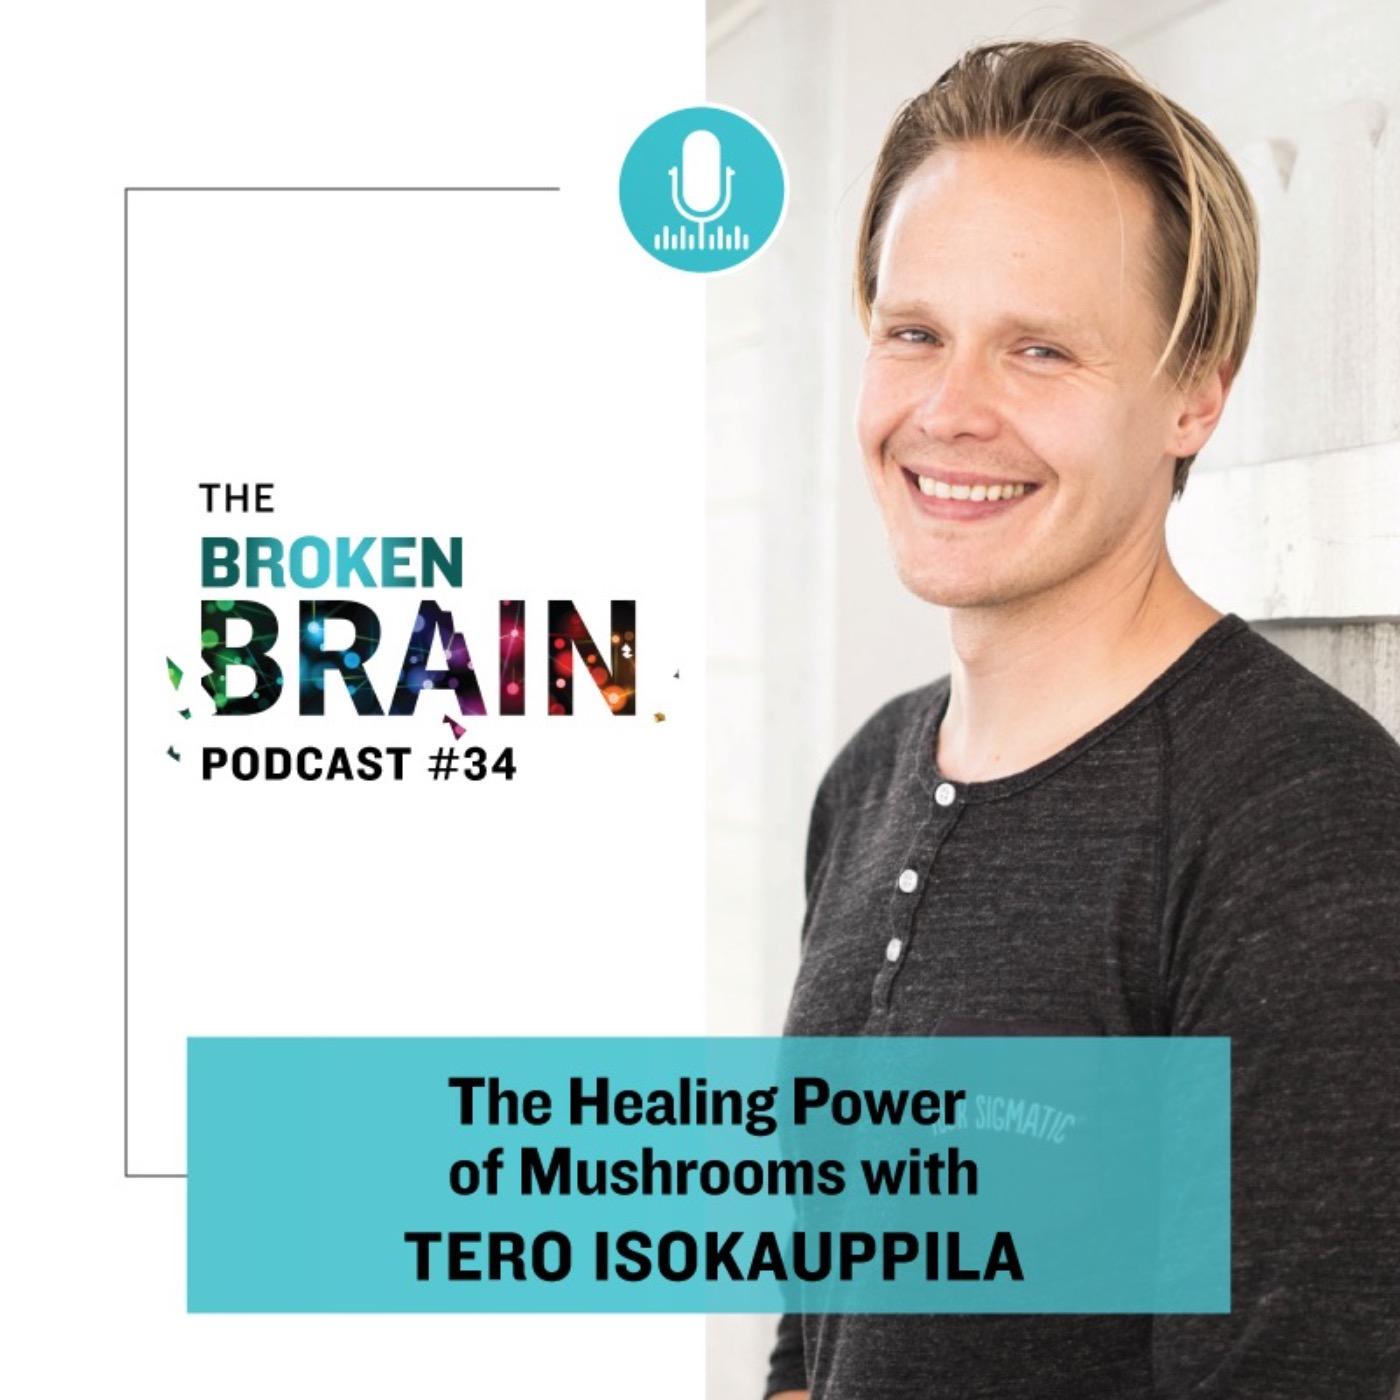 #34: The Healing Power of Mushrooms with Tero Isokauppila